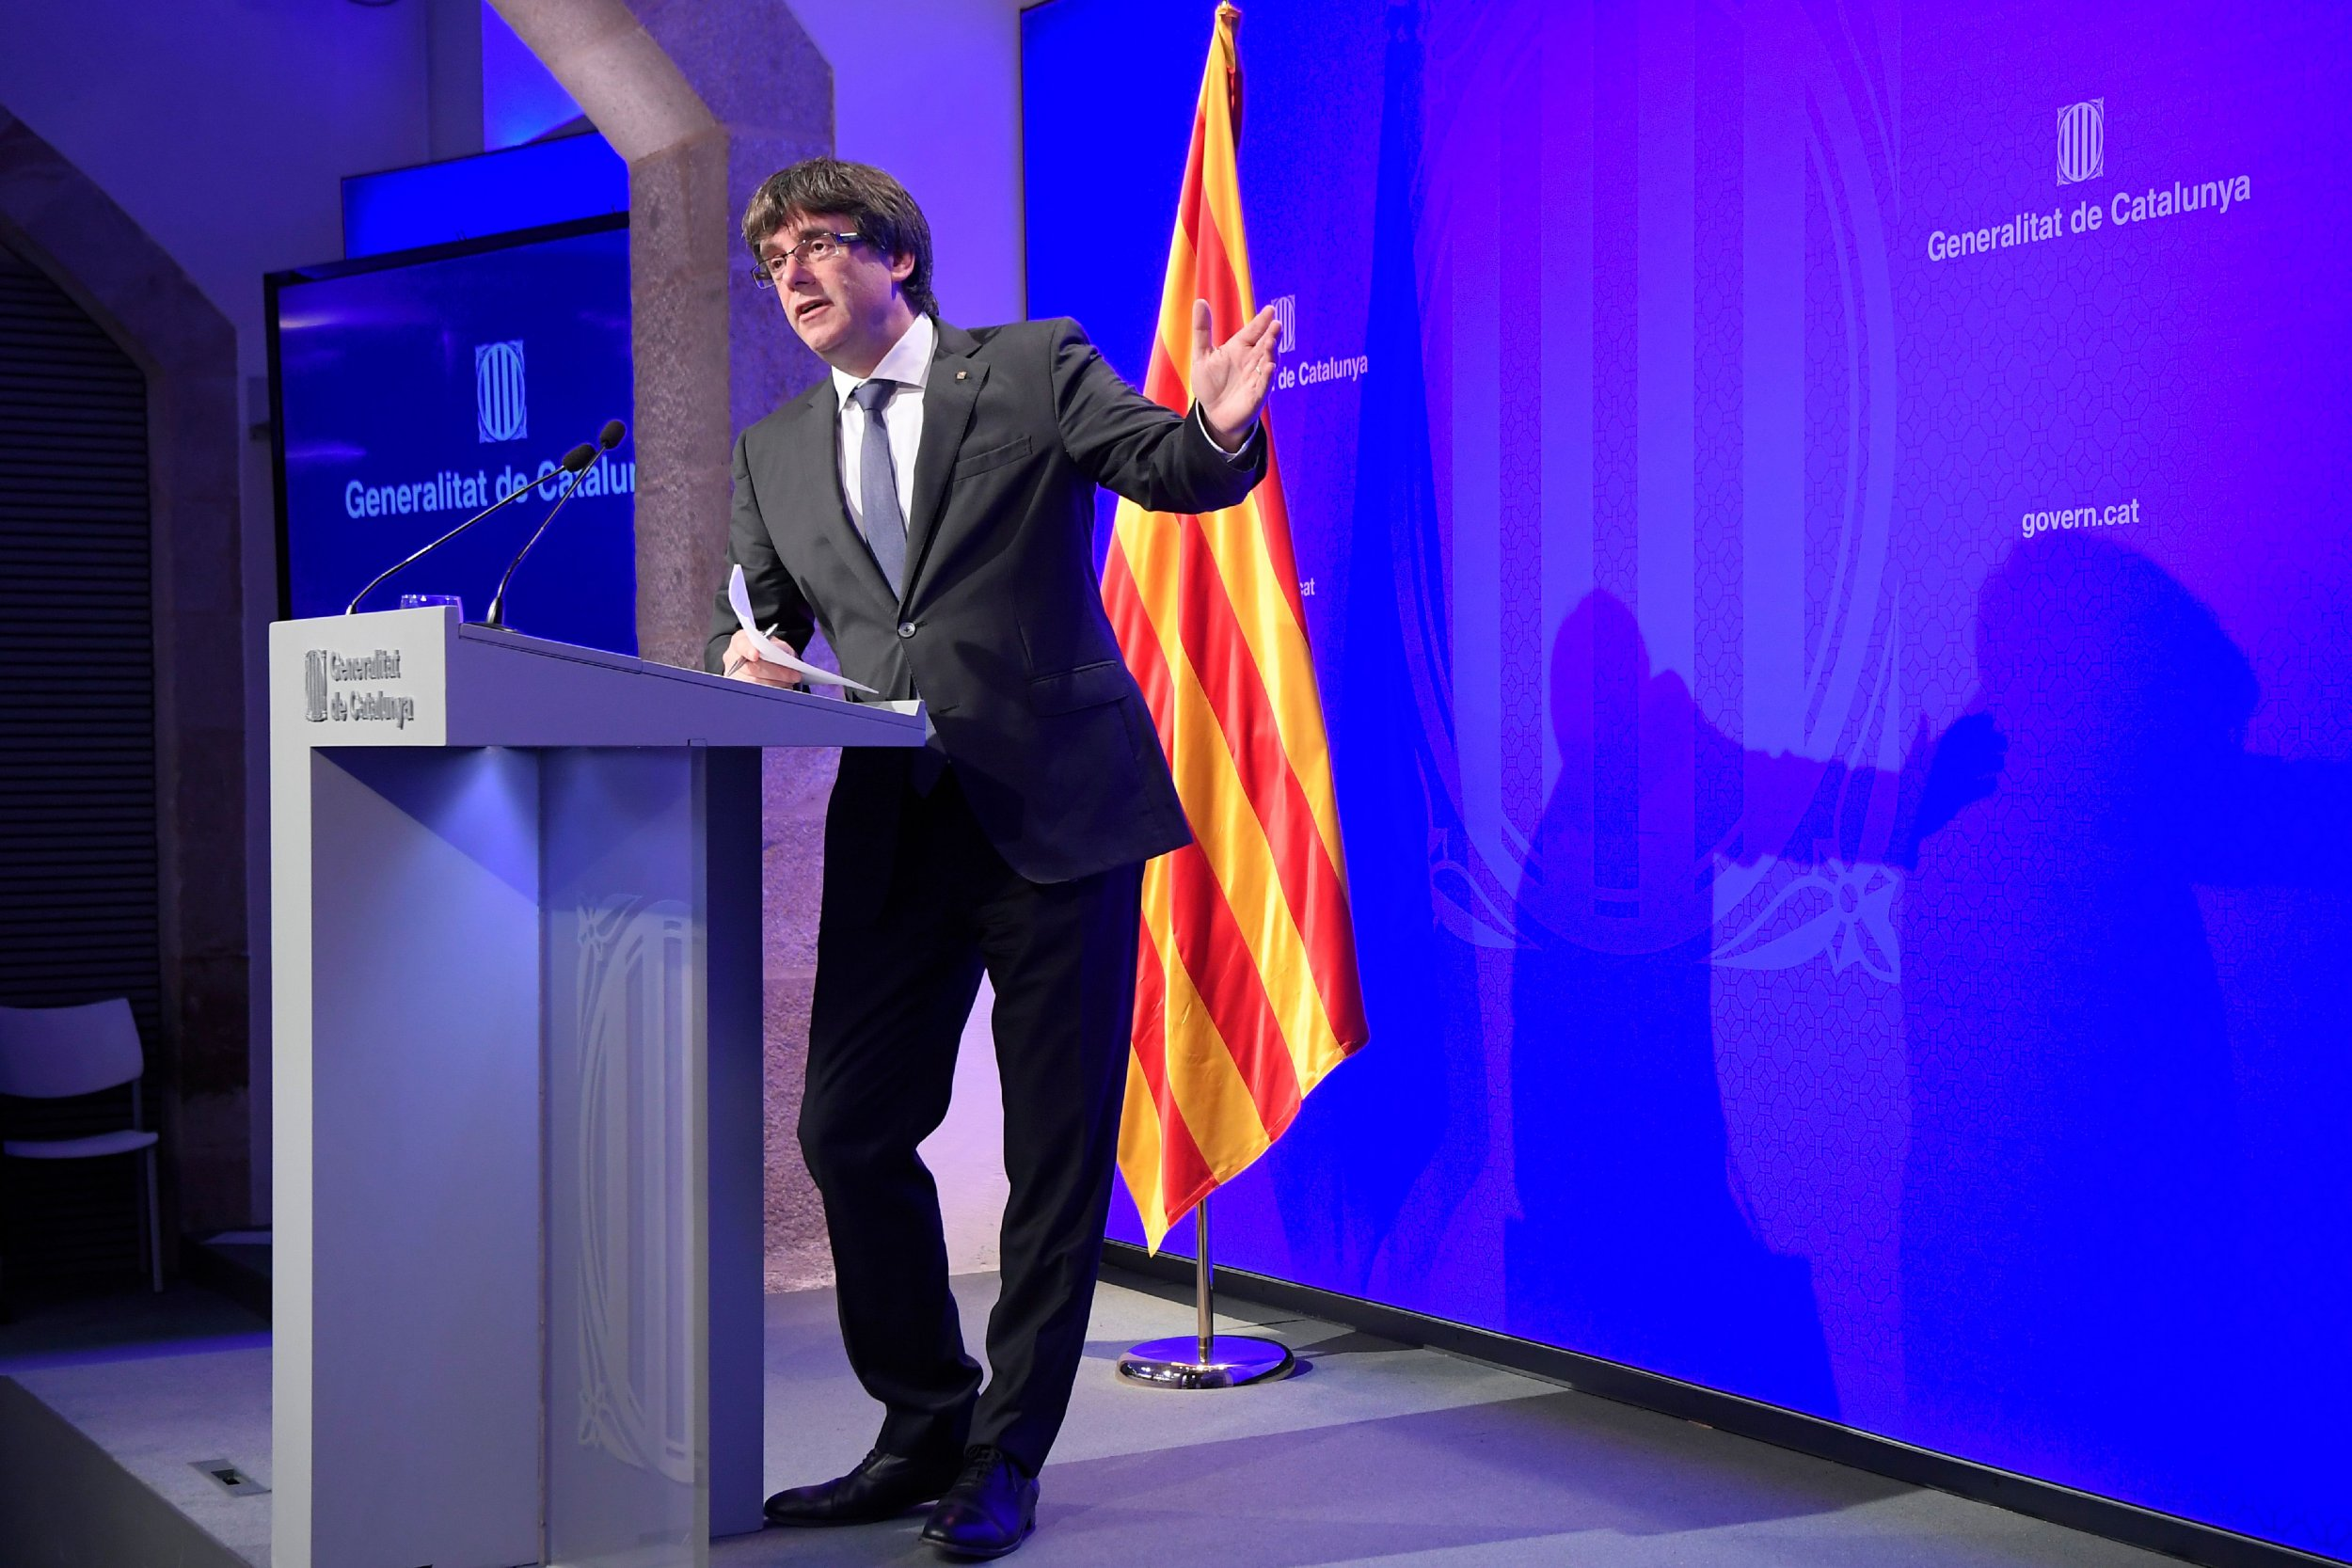 10_02_Carles_Puigdemont_Catalonia